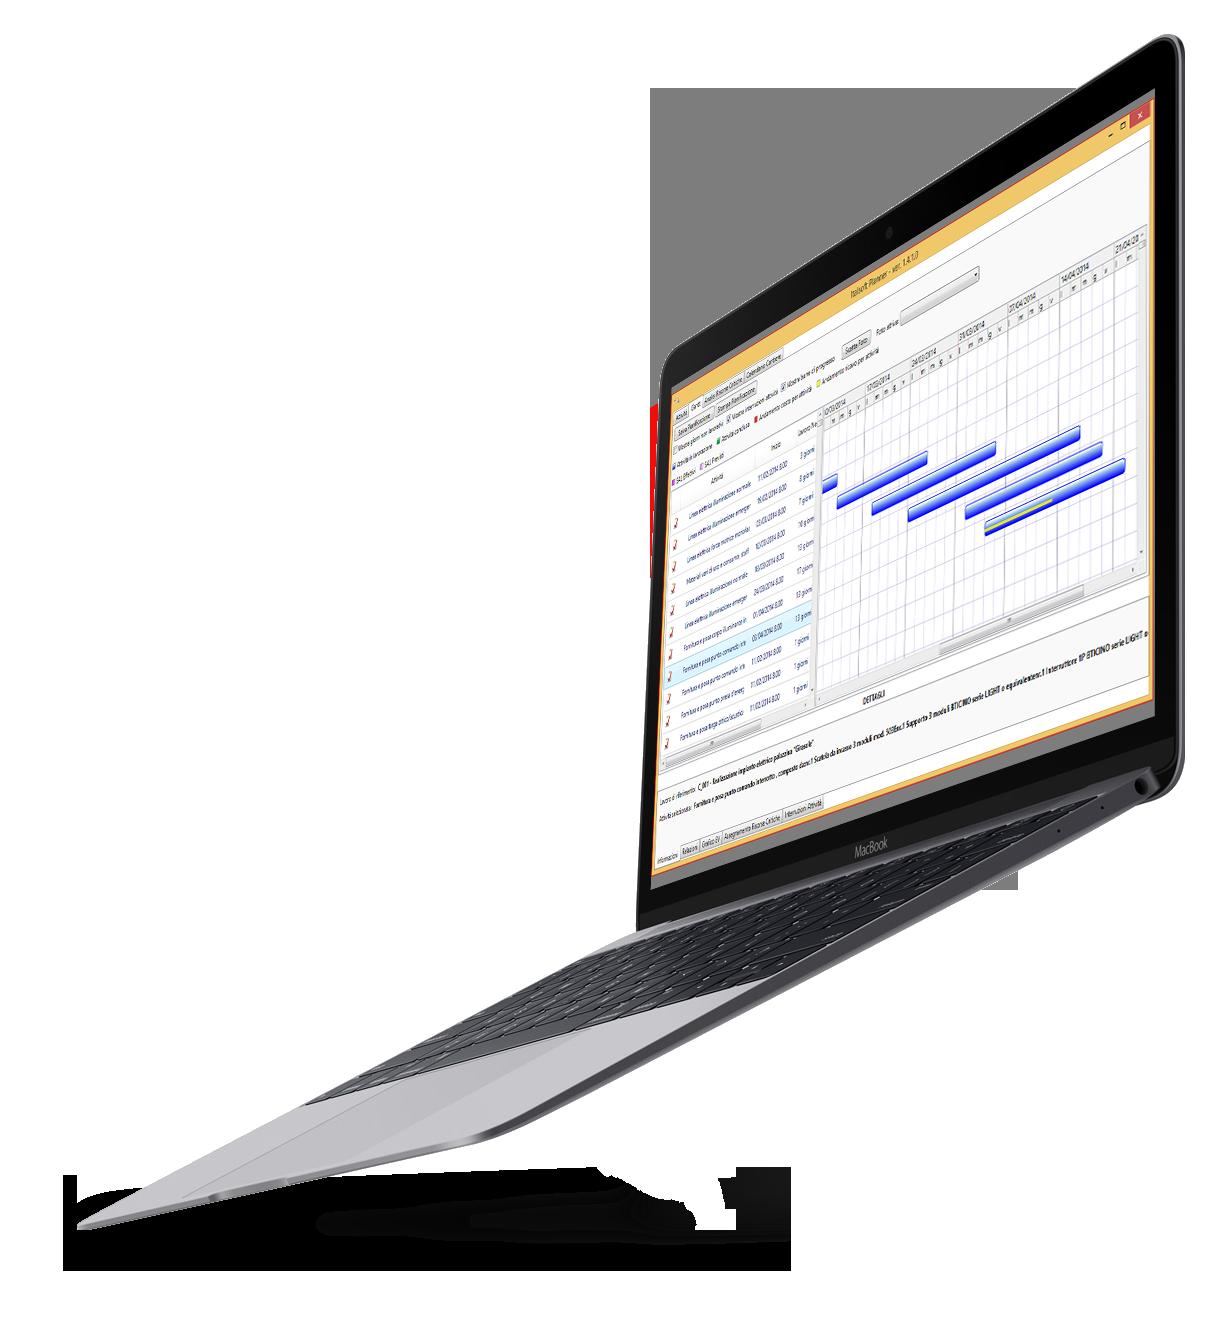 Software per impiantisti - Topimpianti - Gantt